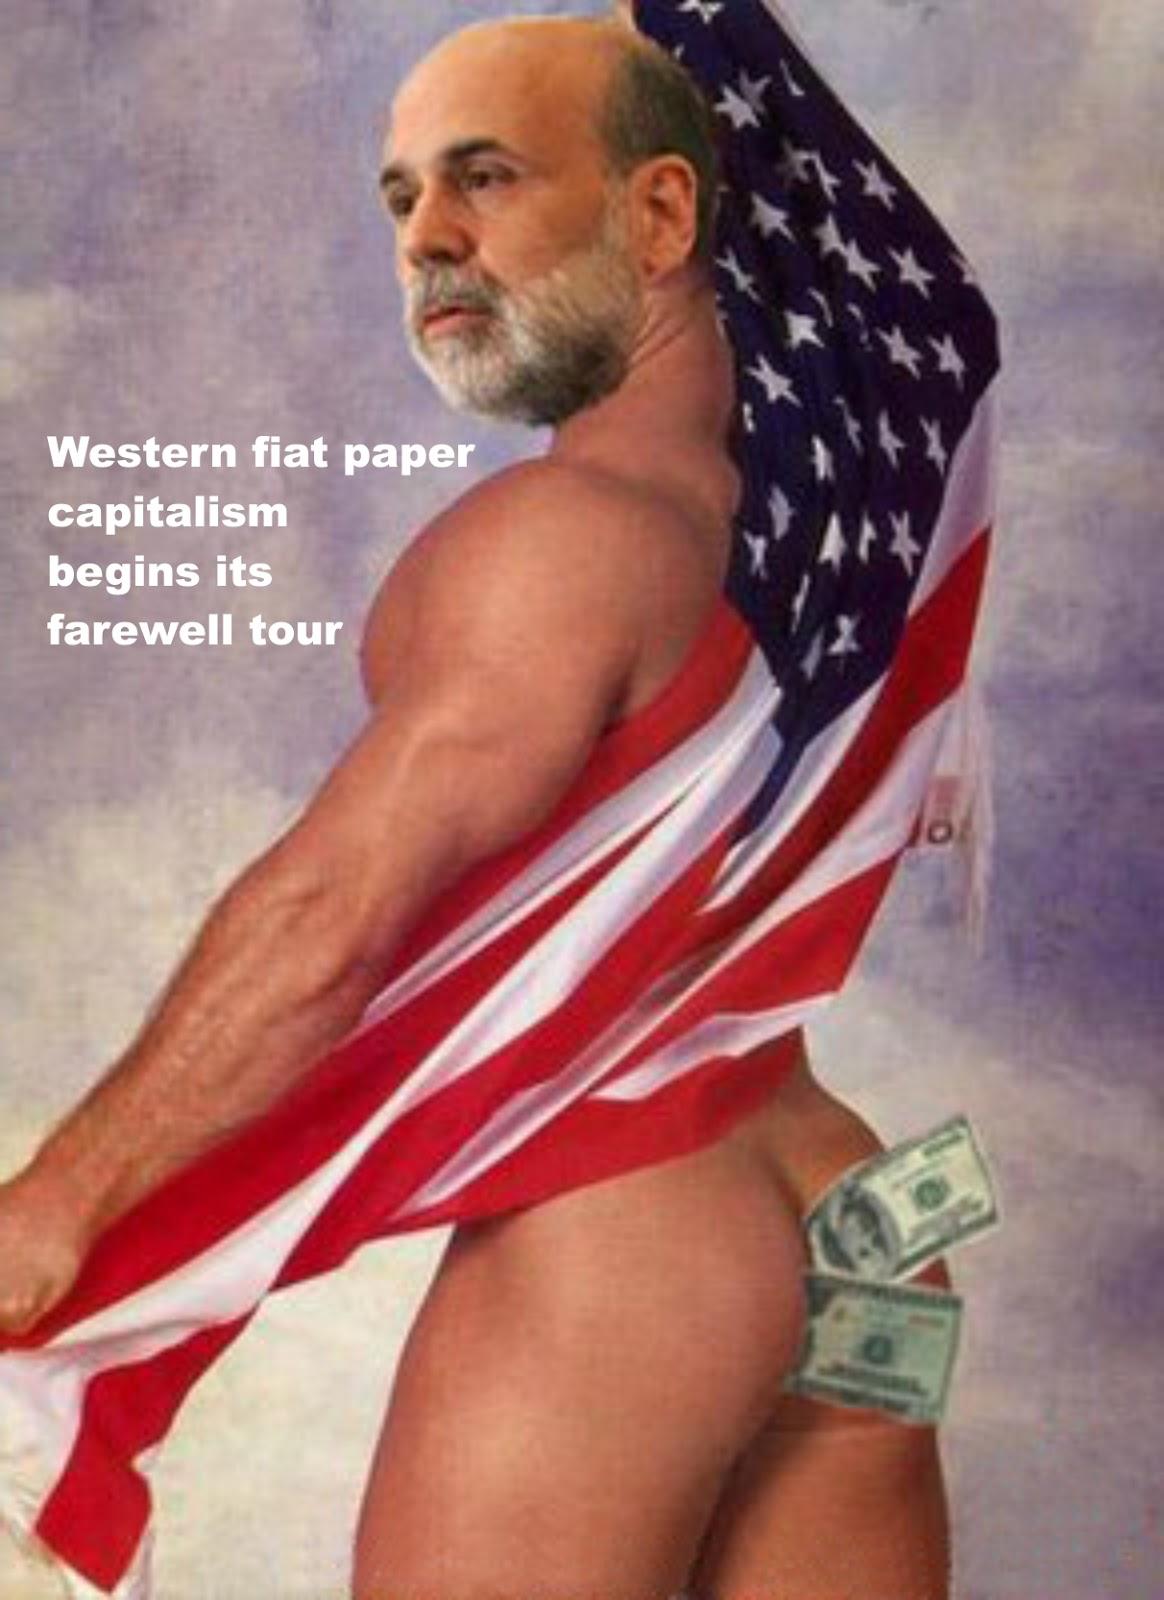 http://3.bp.blogspot.com/-2srLvdgOXNU/VaOfulxYKuI/AAAAAAAAHjM/msVbpnvba60/s1600/Western%2Bcapitalism%2527s%2Bempty%2Bvault.%2B%25231ab.jpg?SSImageQuality=Full